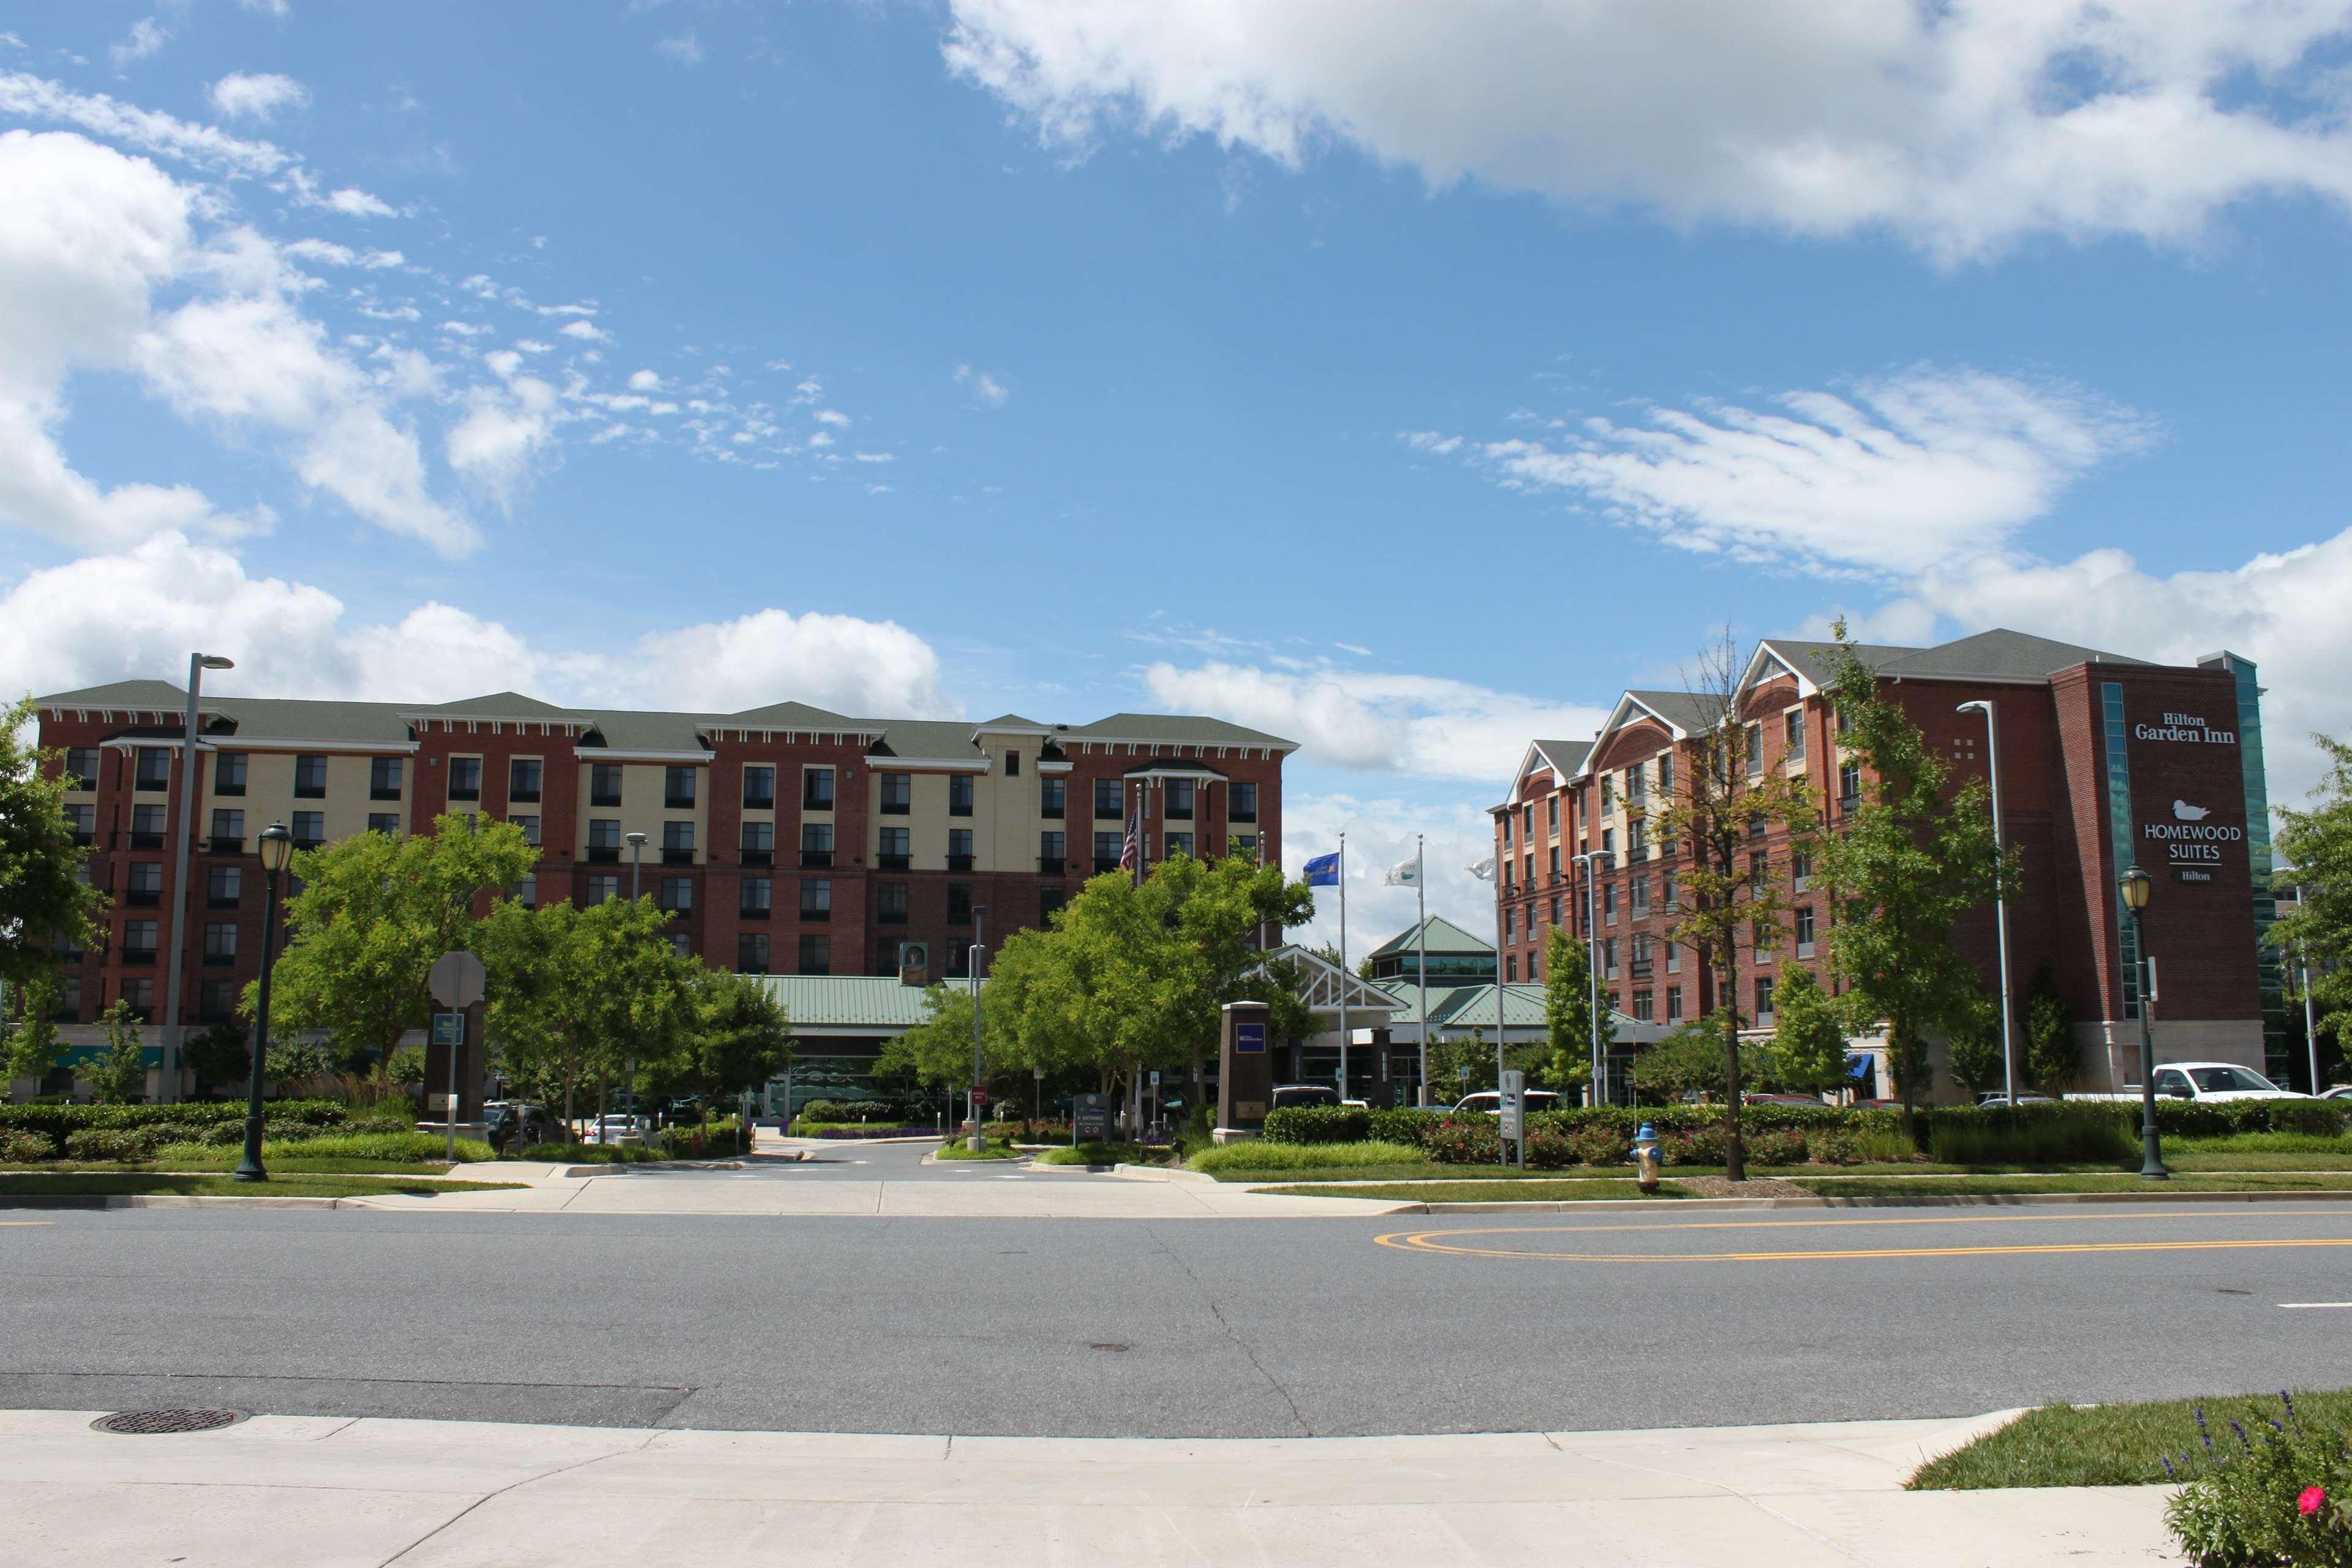 Hilton Garden Inn Rockville-Gaithersburg image 21